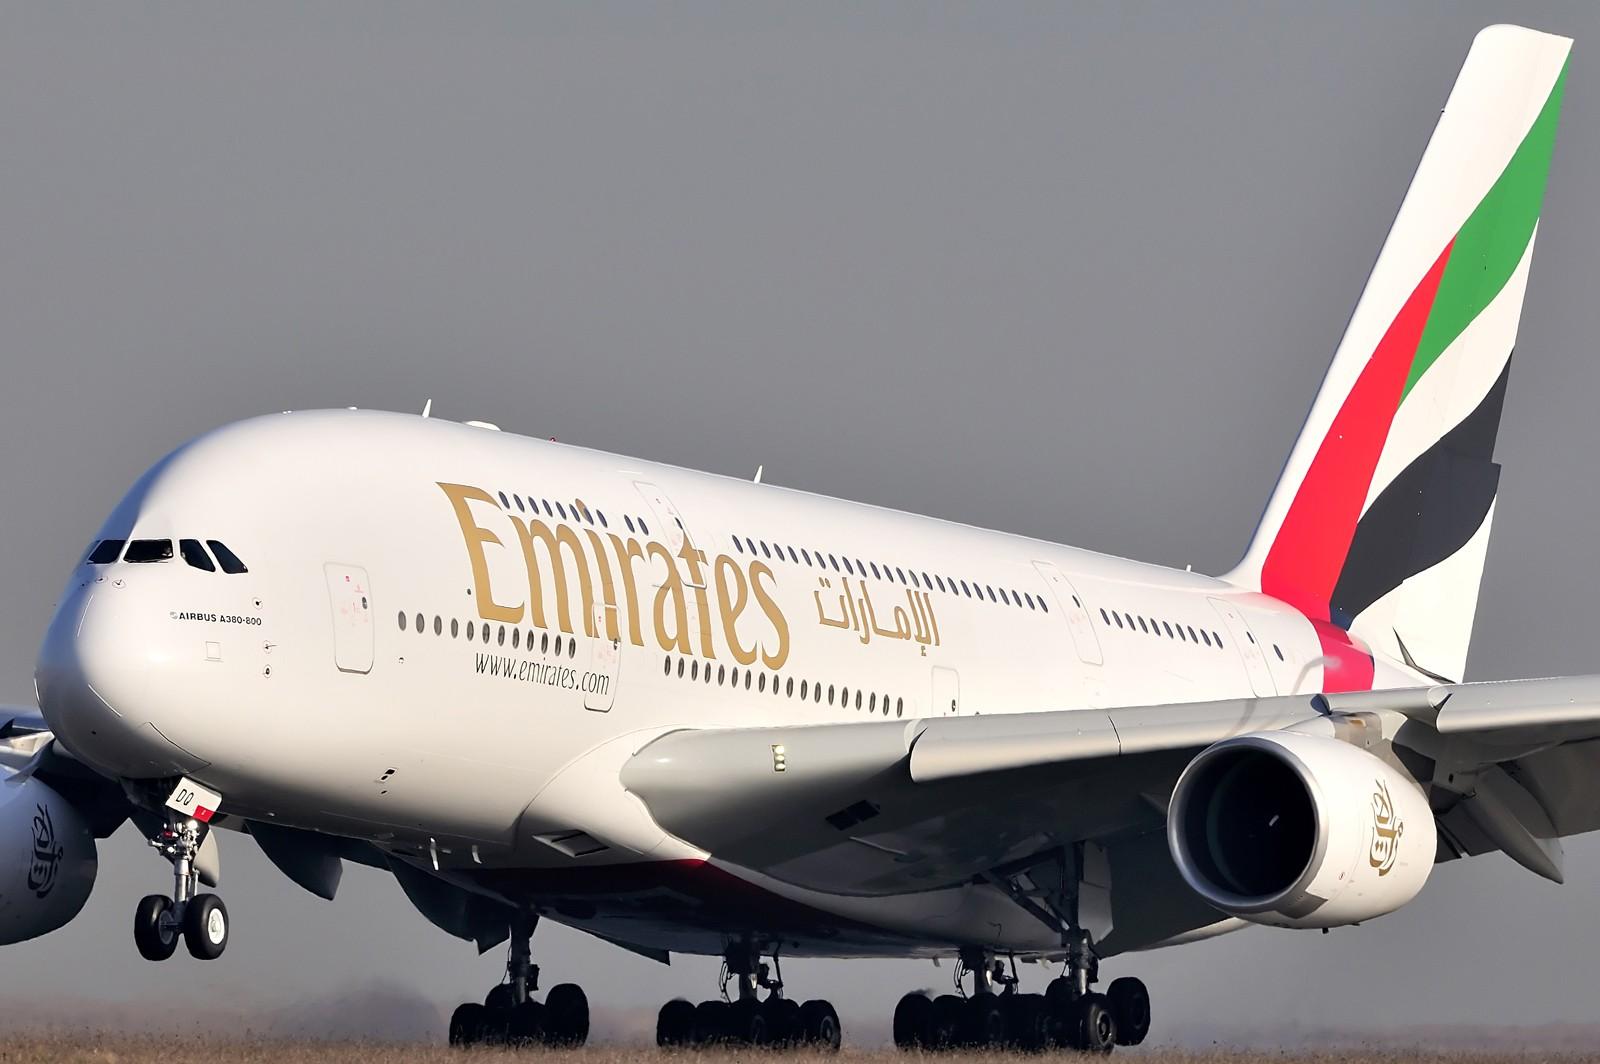 a6-edq-emirates-airbus-a380-861_Samuel Dupont